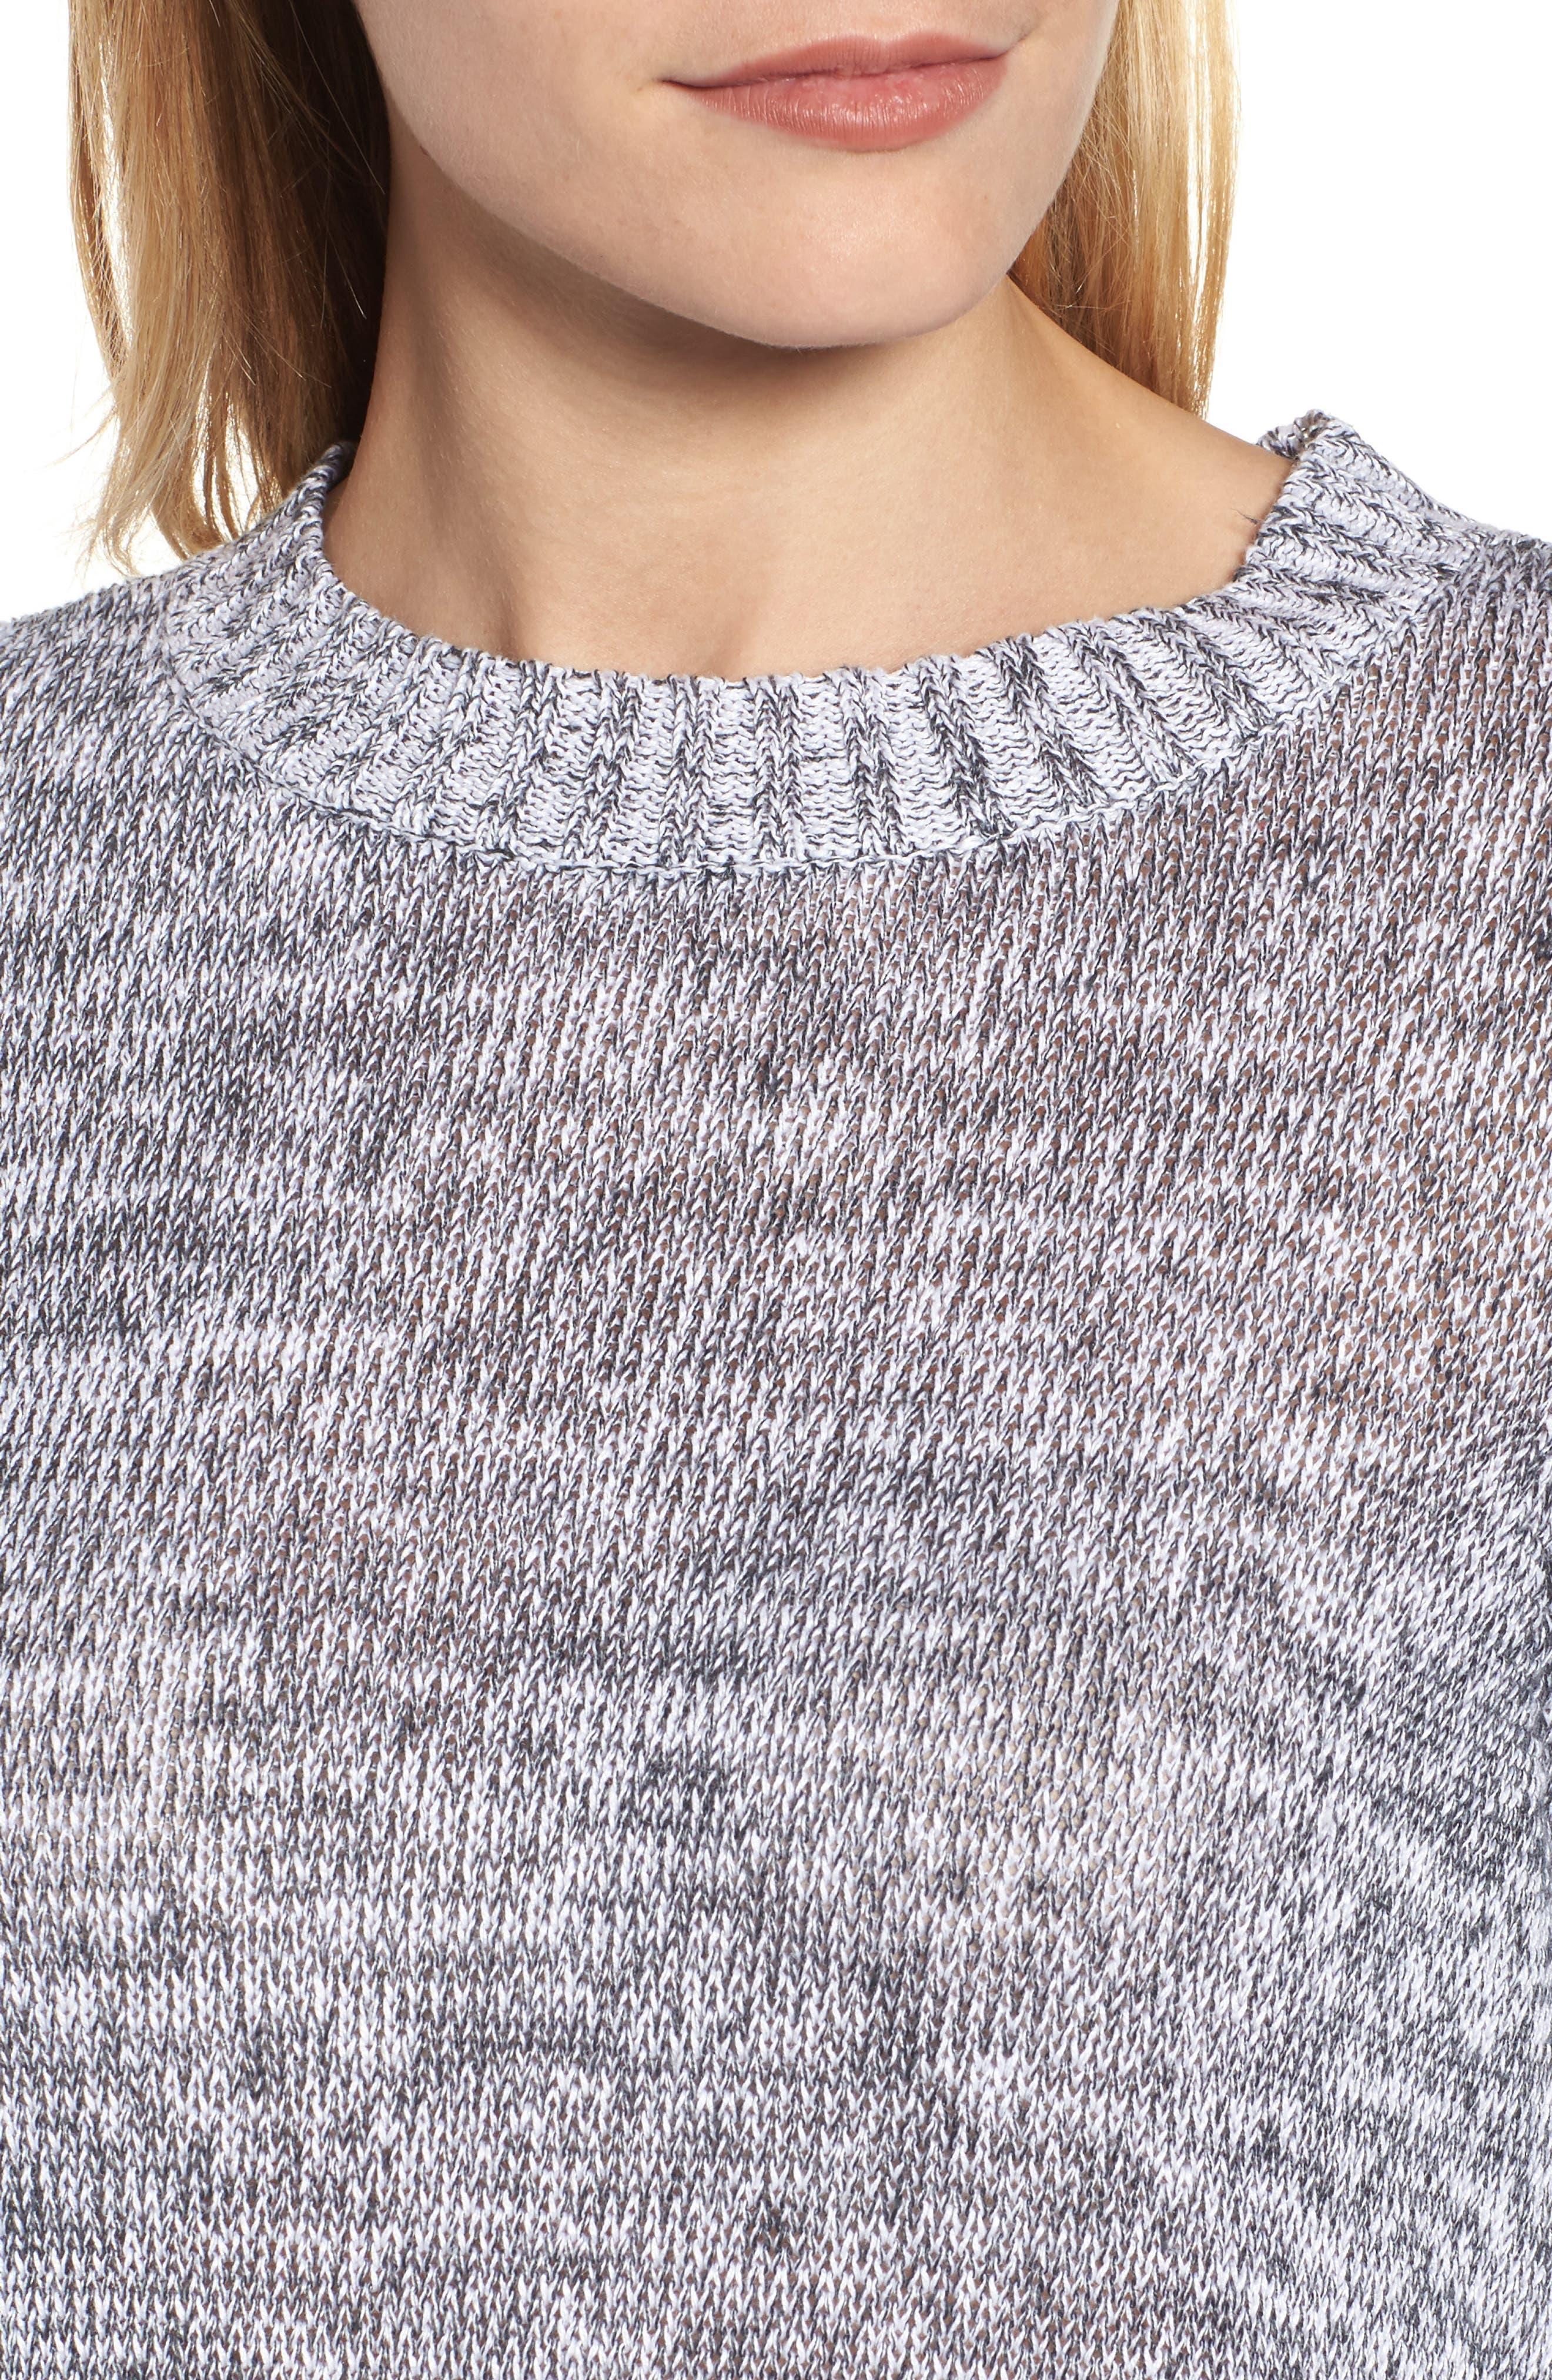 Alternate Image 4  - Eileen Fisher Organic Linen Crewneck Sweater